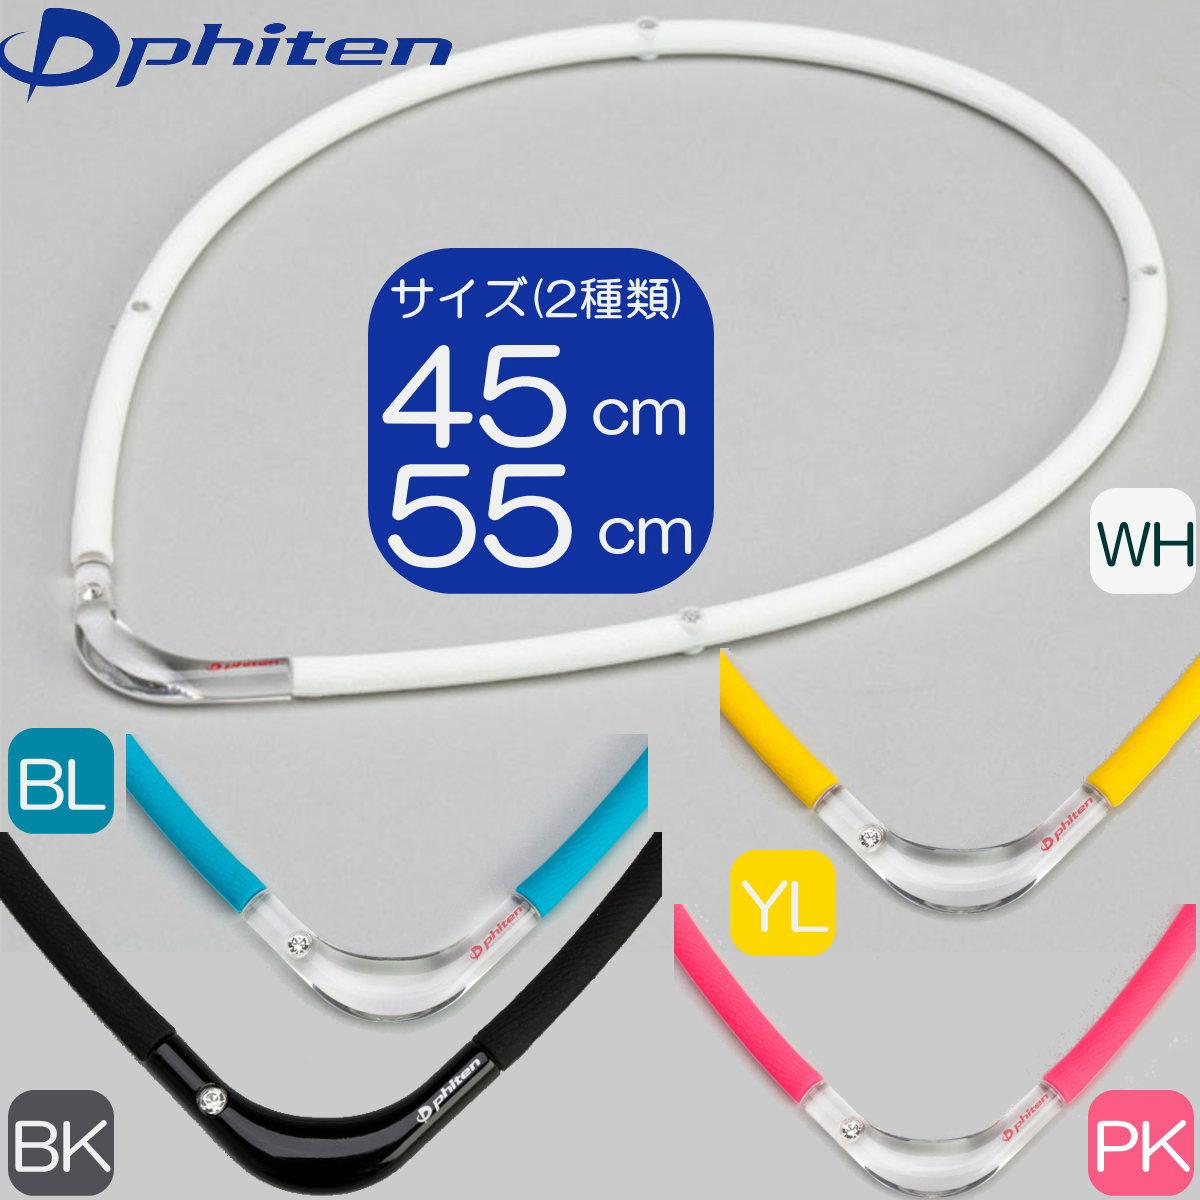 V字のトップにクリスタルを配置したオシャレなデザイン 感謝価格 送料300円 Phiten RAKUWA 磁気チタンネックレスS-2 全5色 ファイテン S- 2サイズ ☆国内最安値に挑戦☆